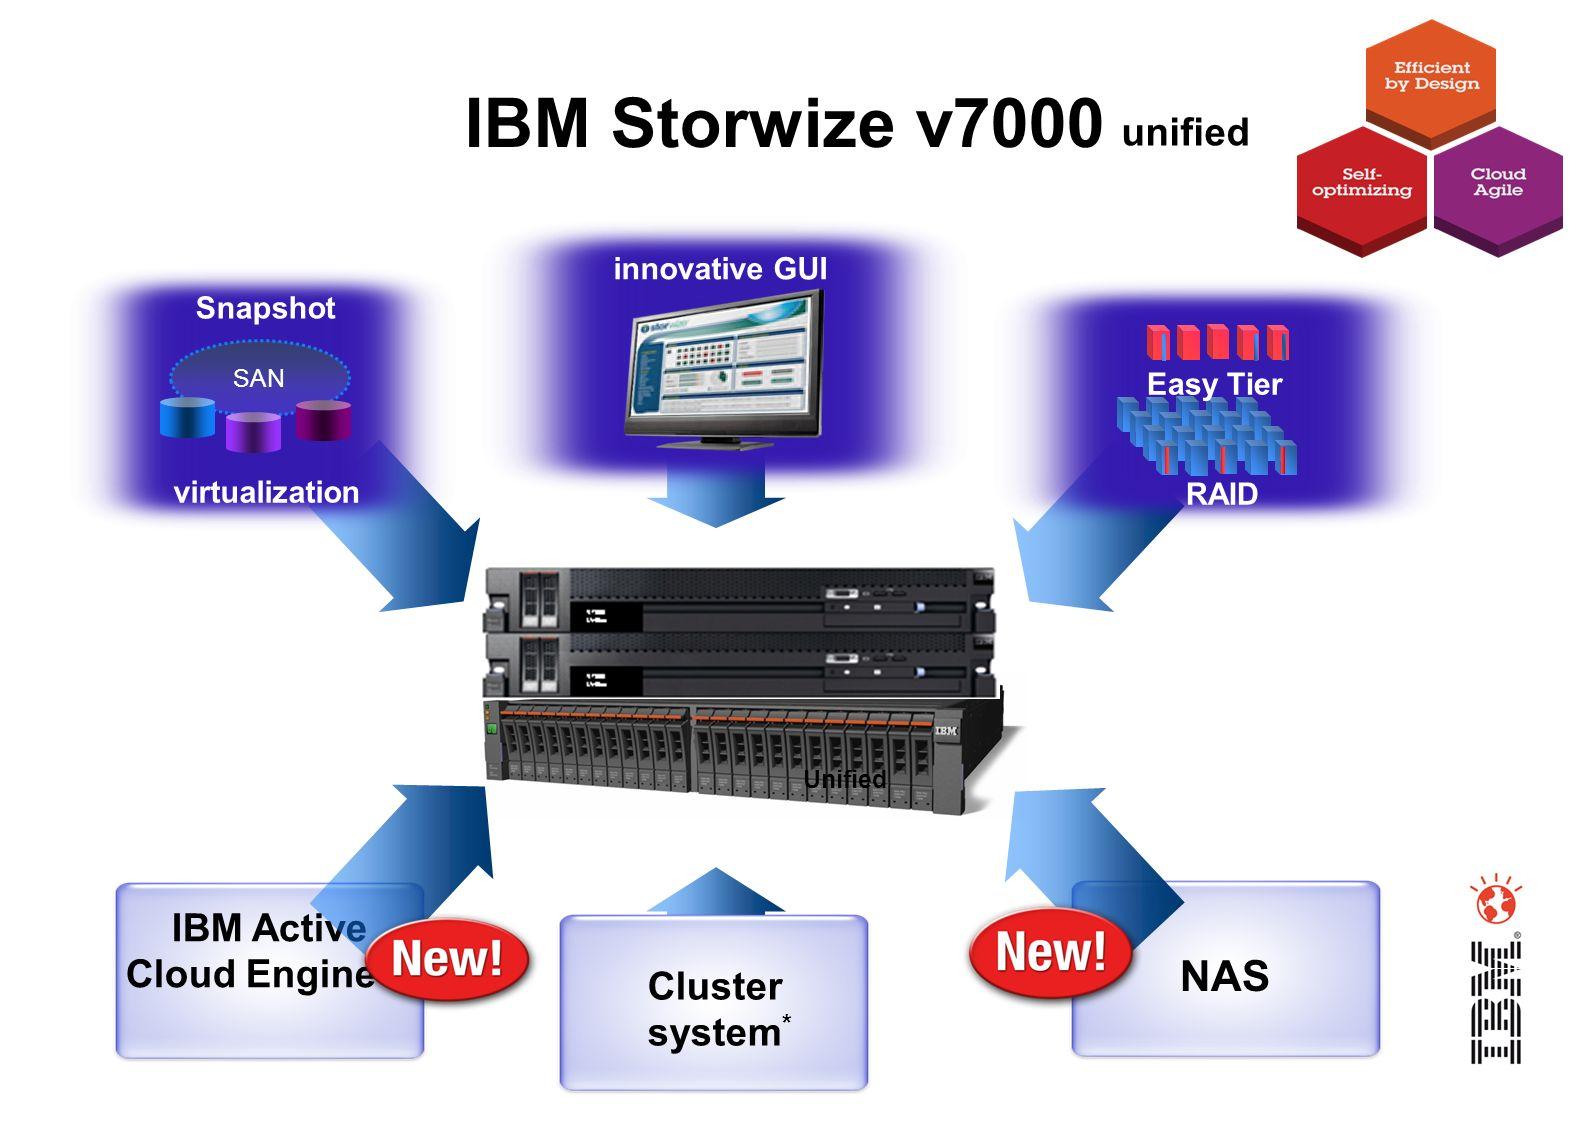 Cluster system * Easy Tier RAID innovative GUI SAN virtualization Snapshot IBM Storwize V7000 IBM Storwize v7000 IBM Active Cloud Engine NAS Unified u